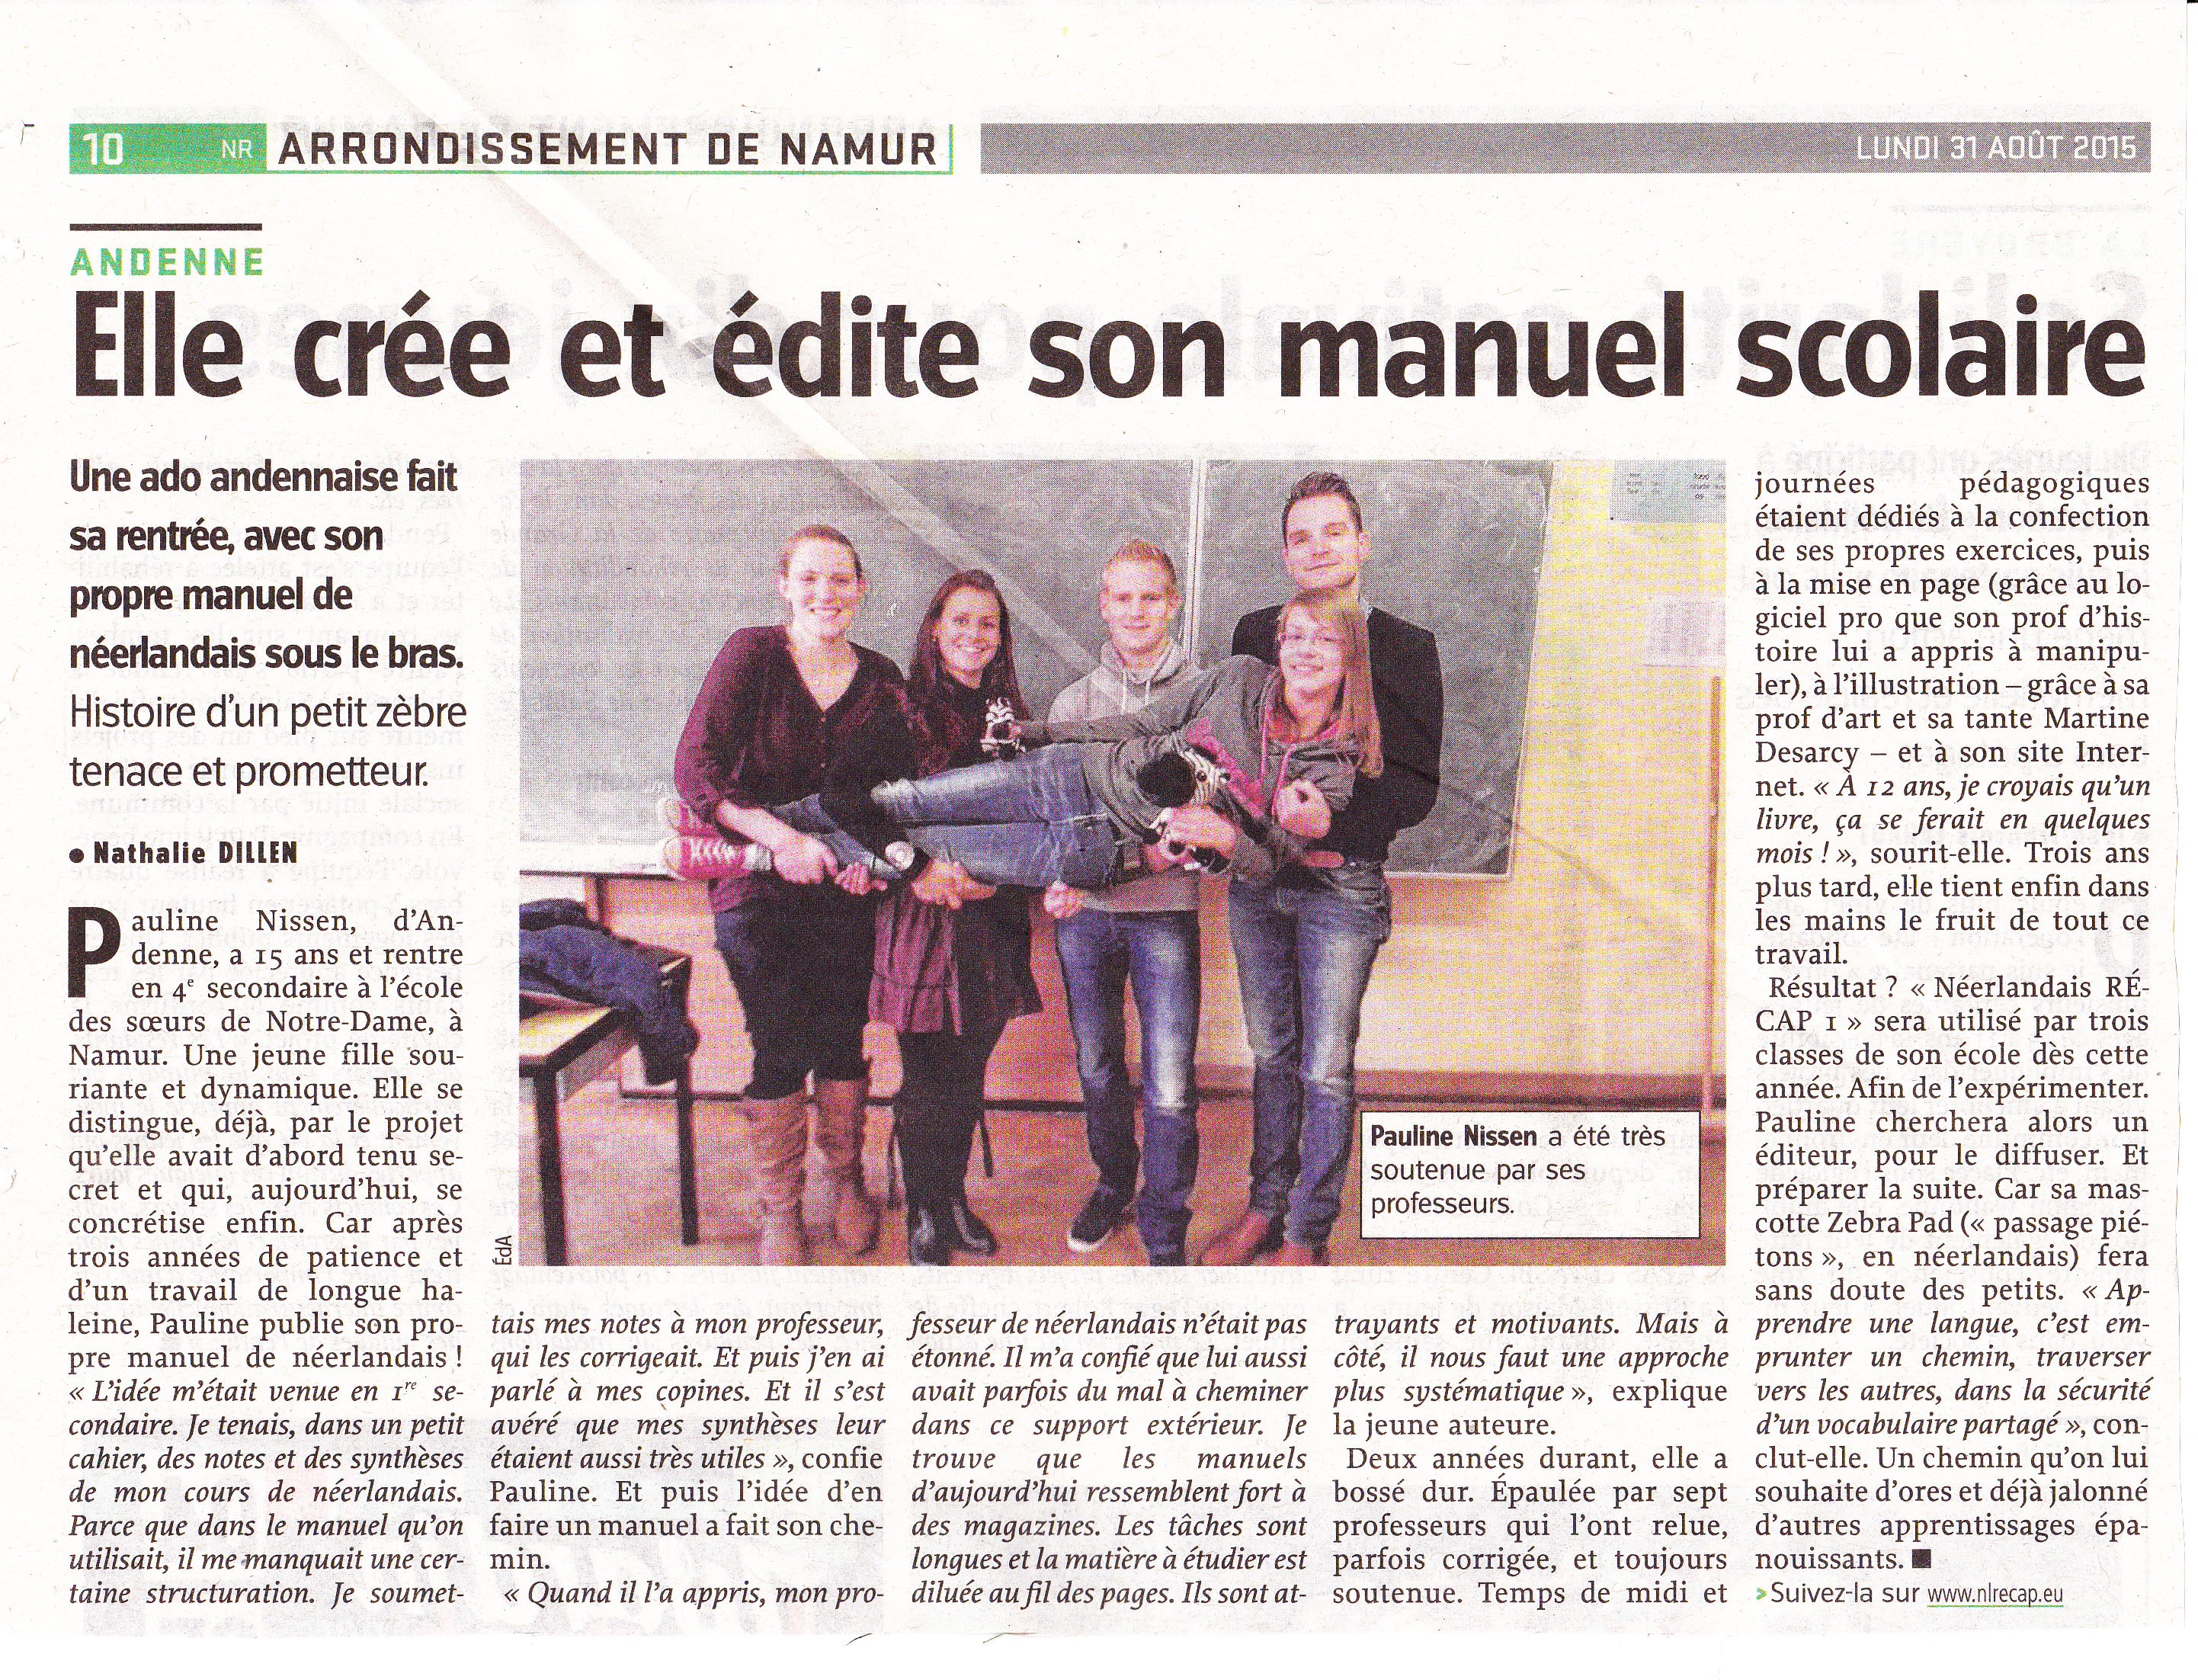 Article_Vers_L'Avenir_Namur_20150831_0002